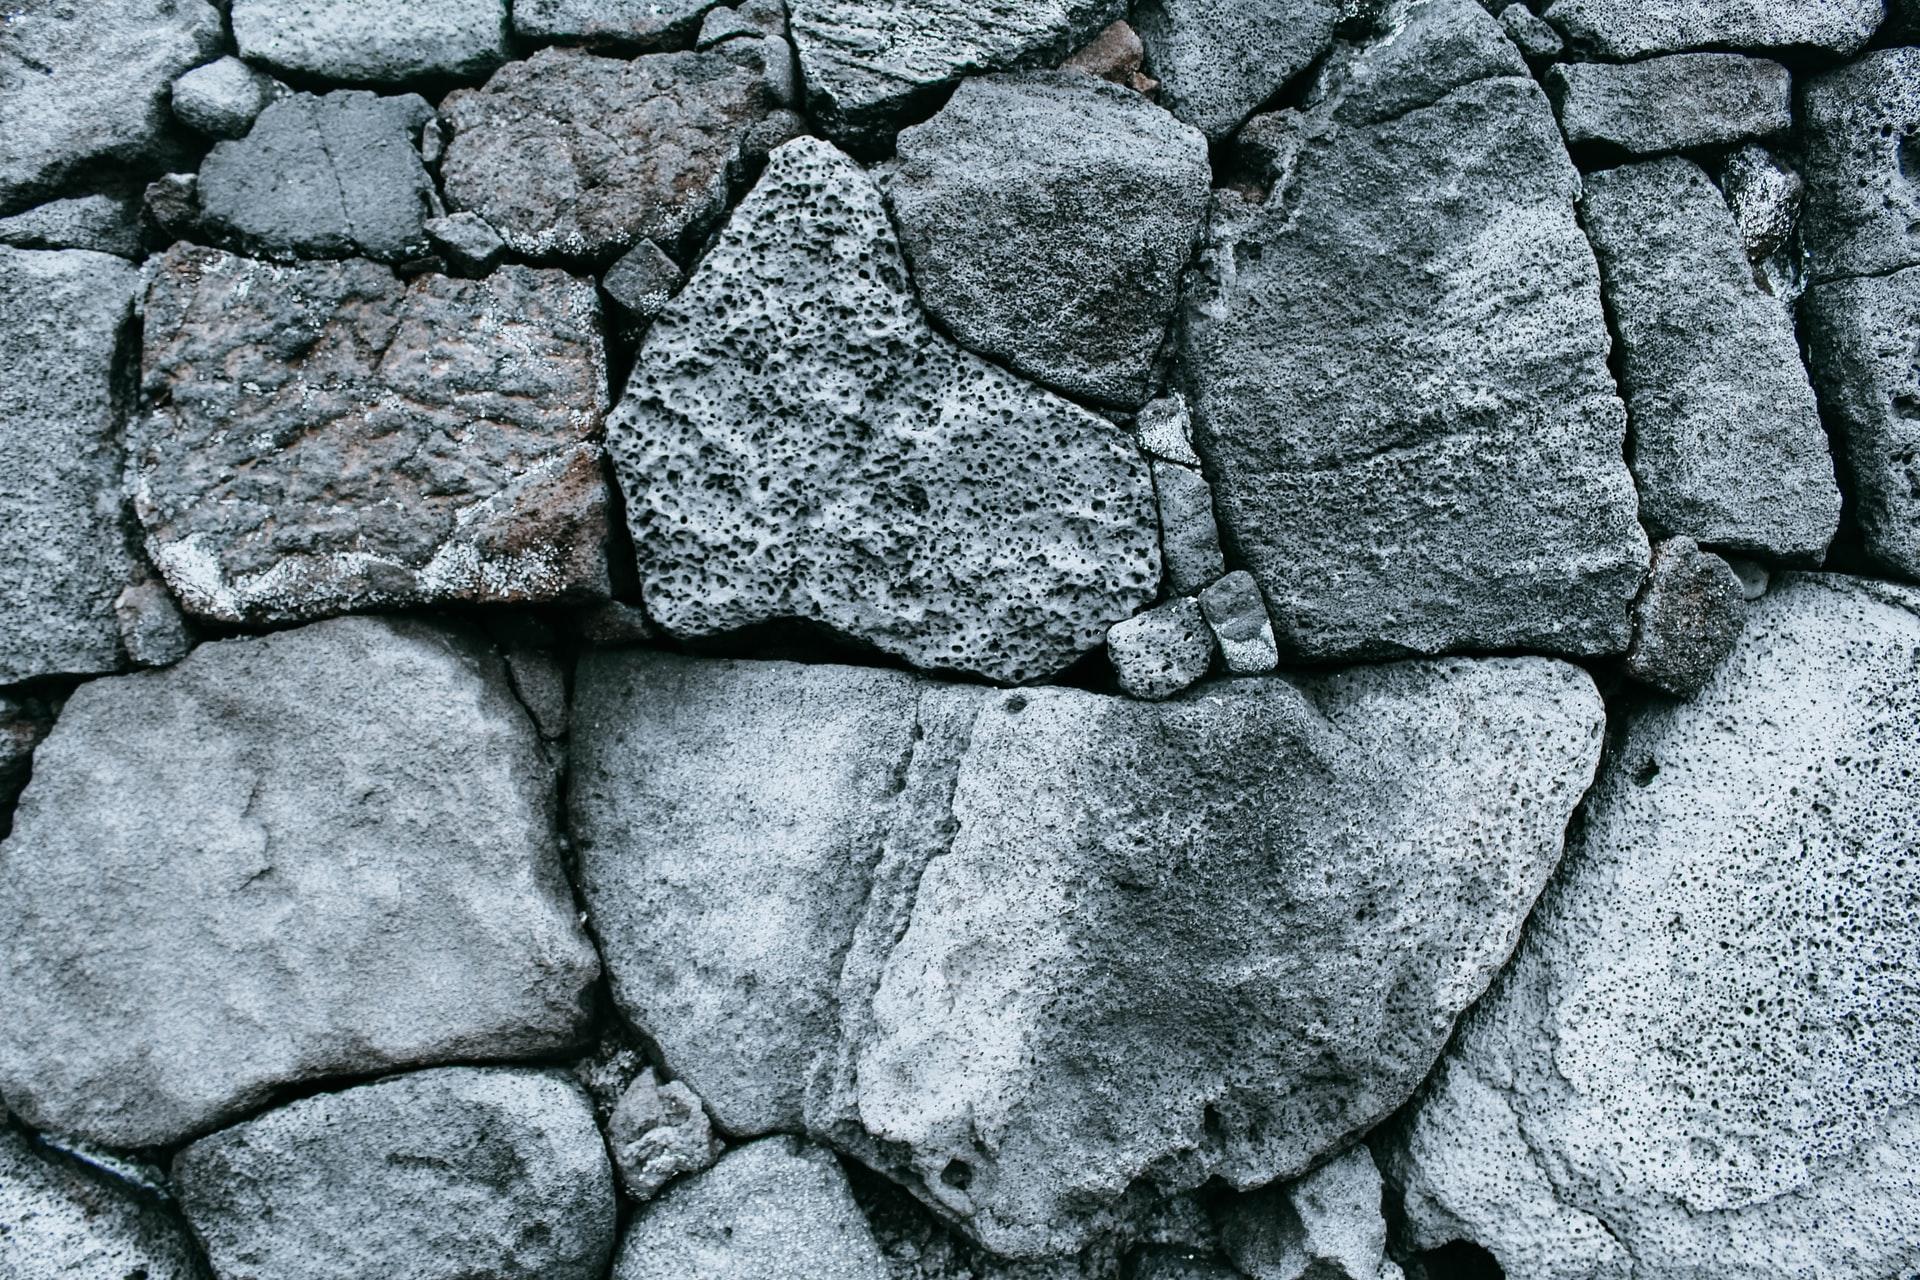 snackenglish, snack, piedras, rocas, wall, muro, pared